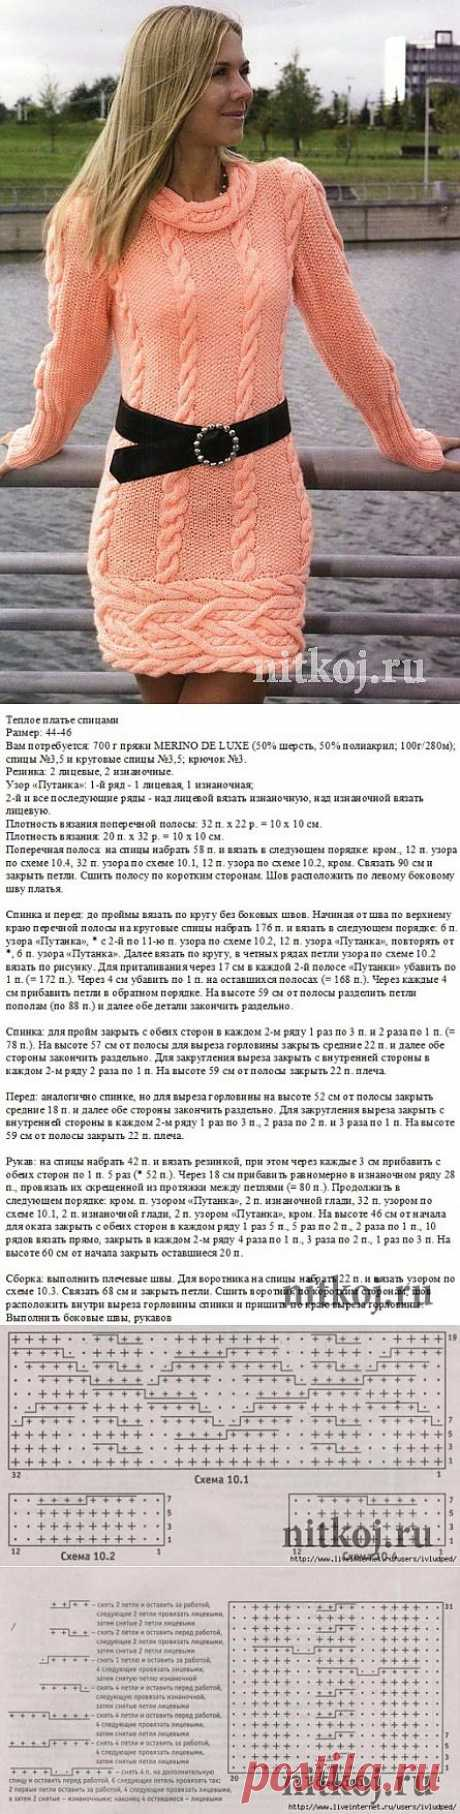 Vladimir Svarnoy: Hi, Alyona! To welcome good …